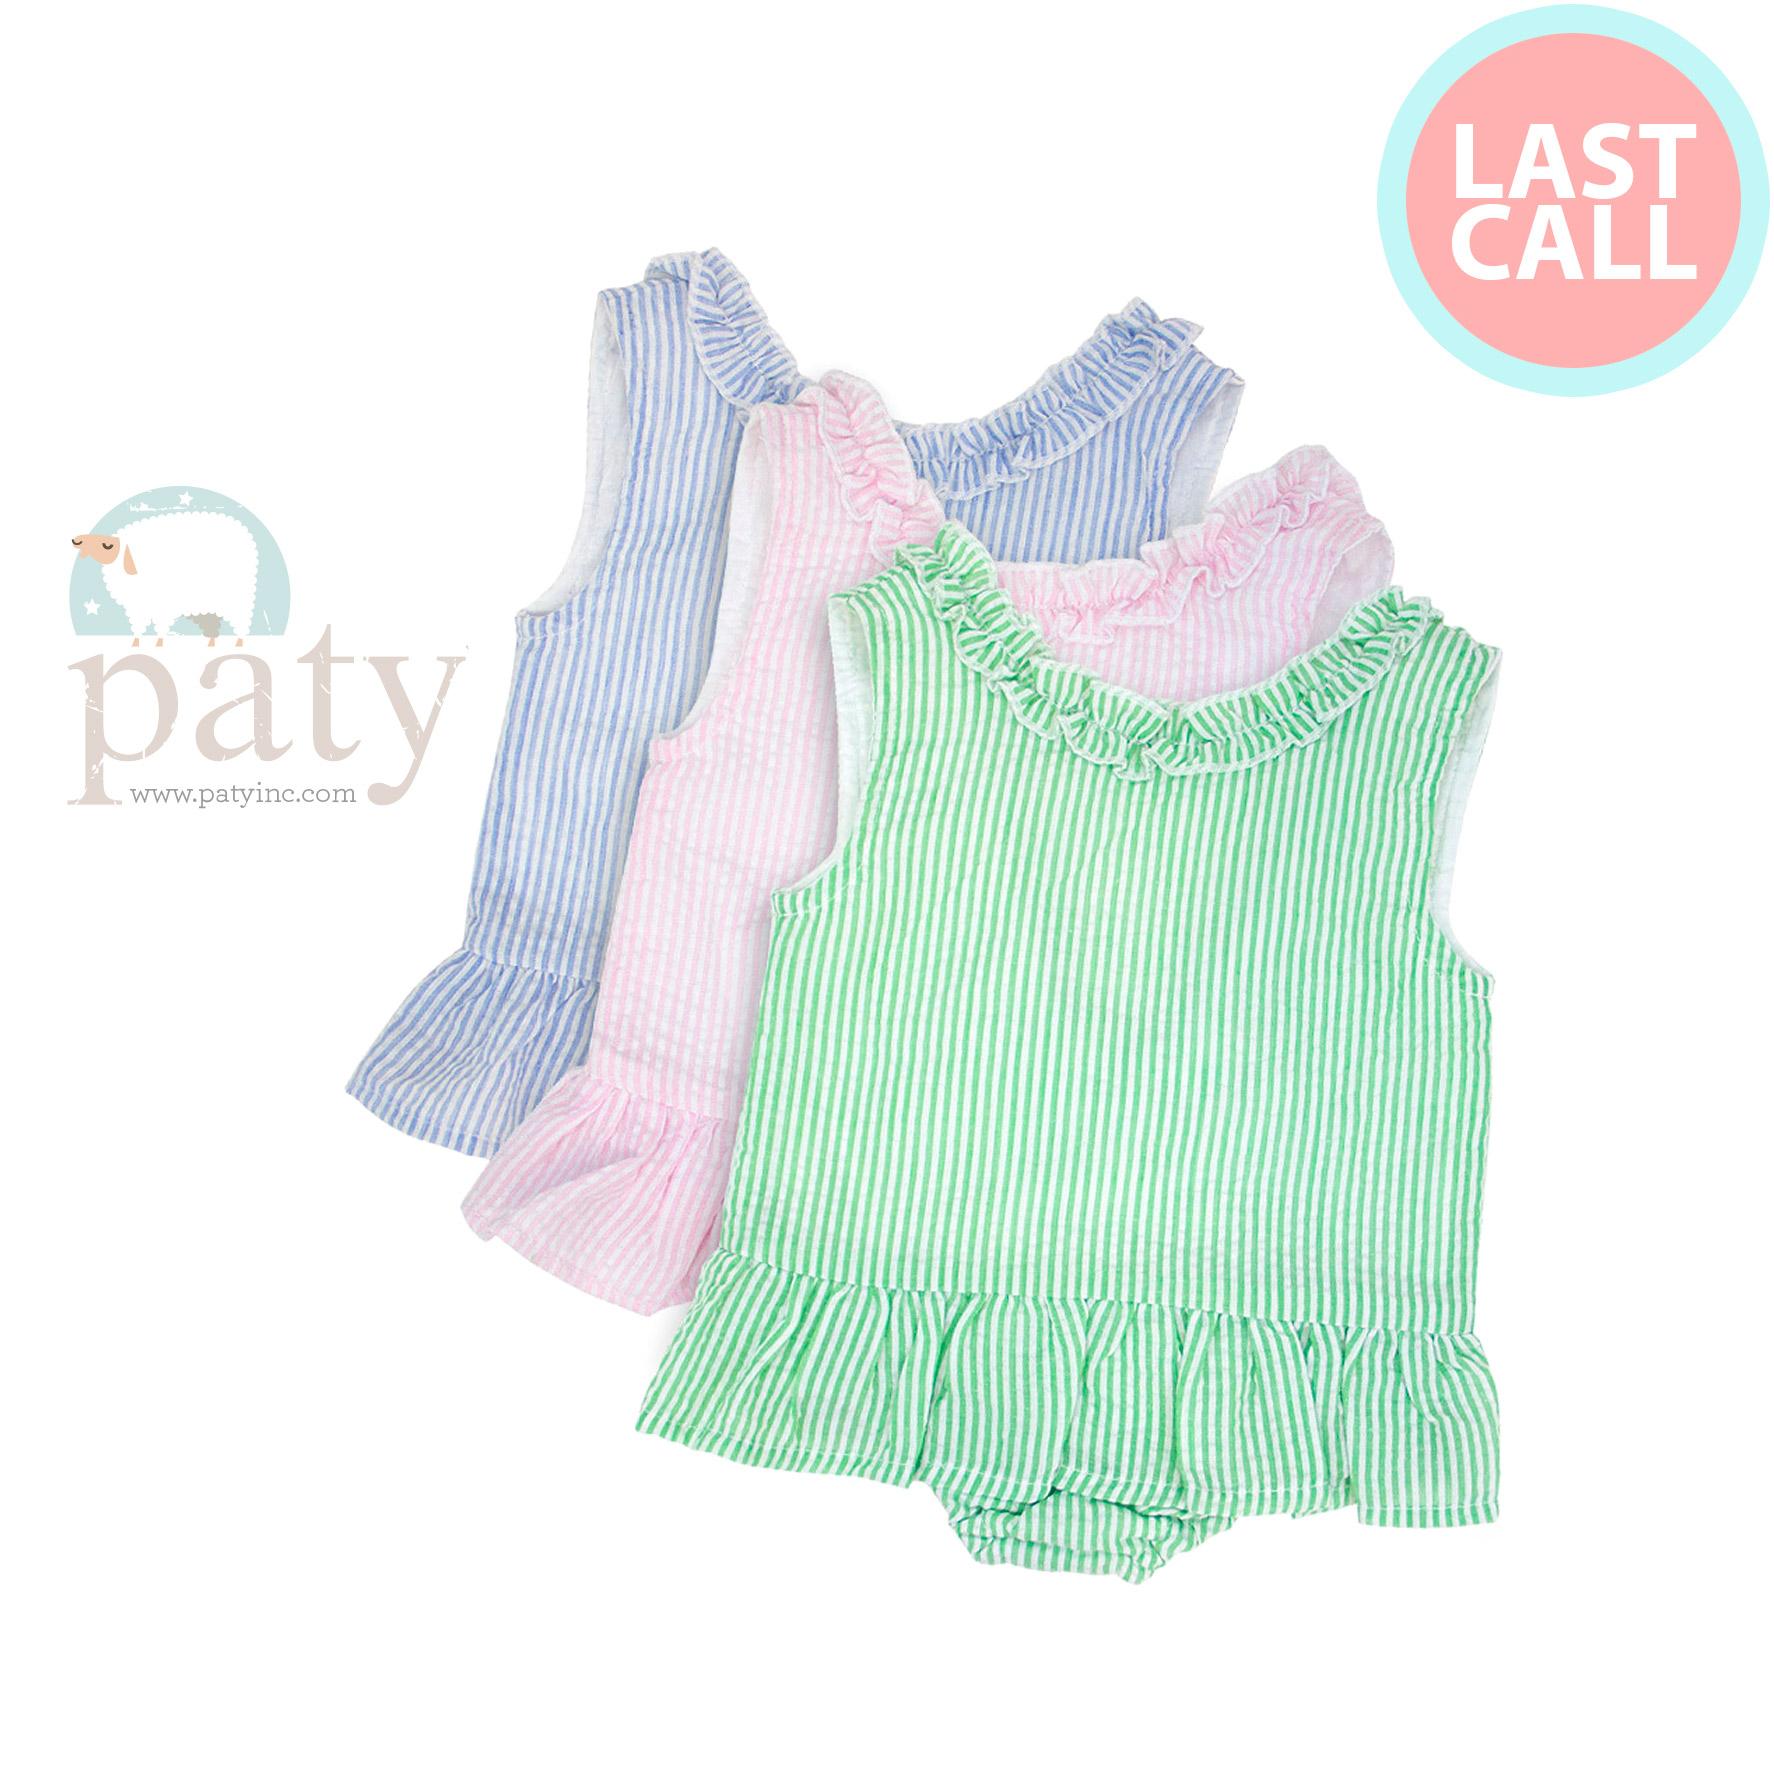 Last Call Paty Seersucker Girls Swimsuit